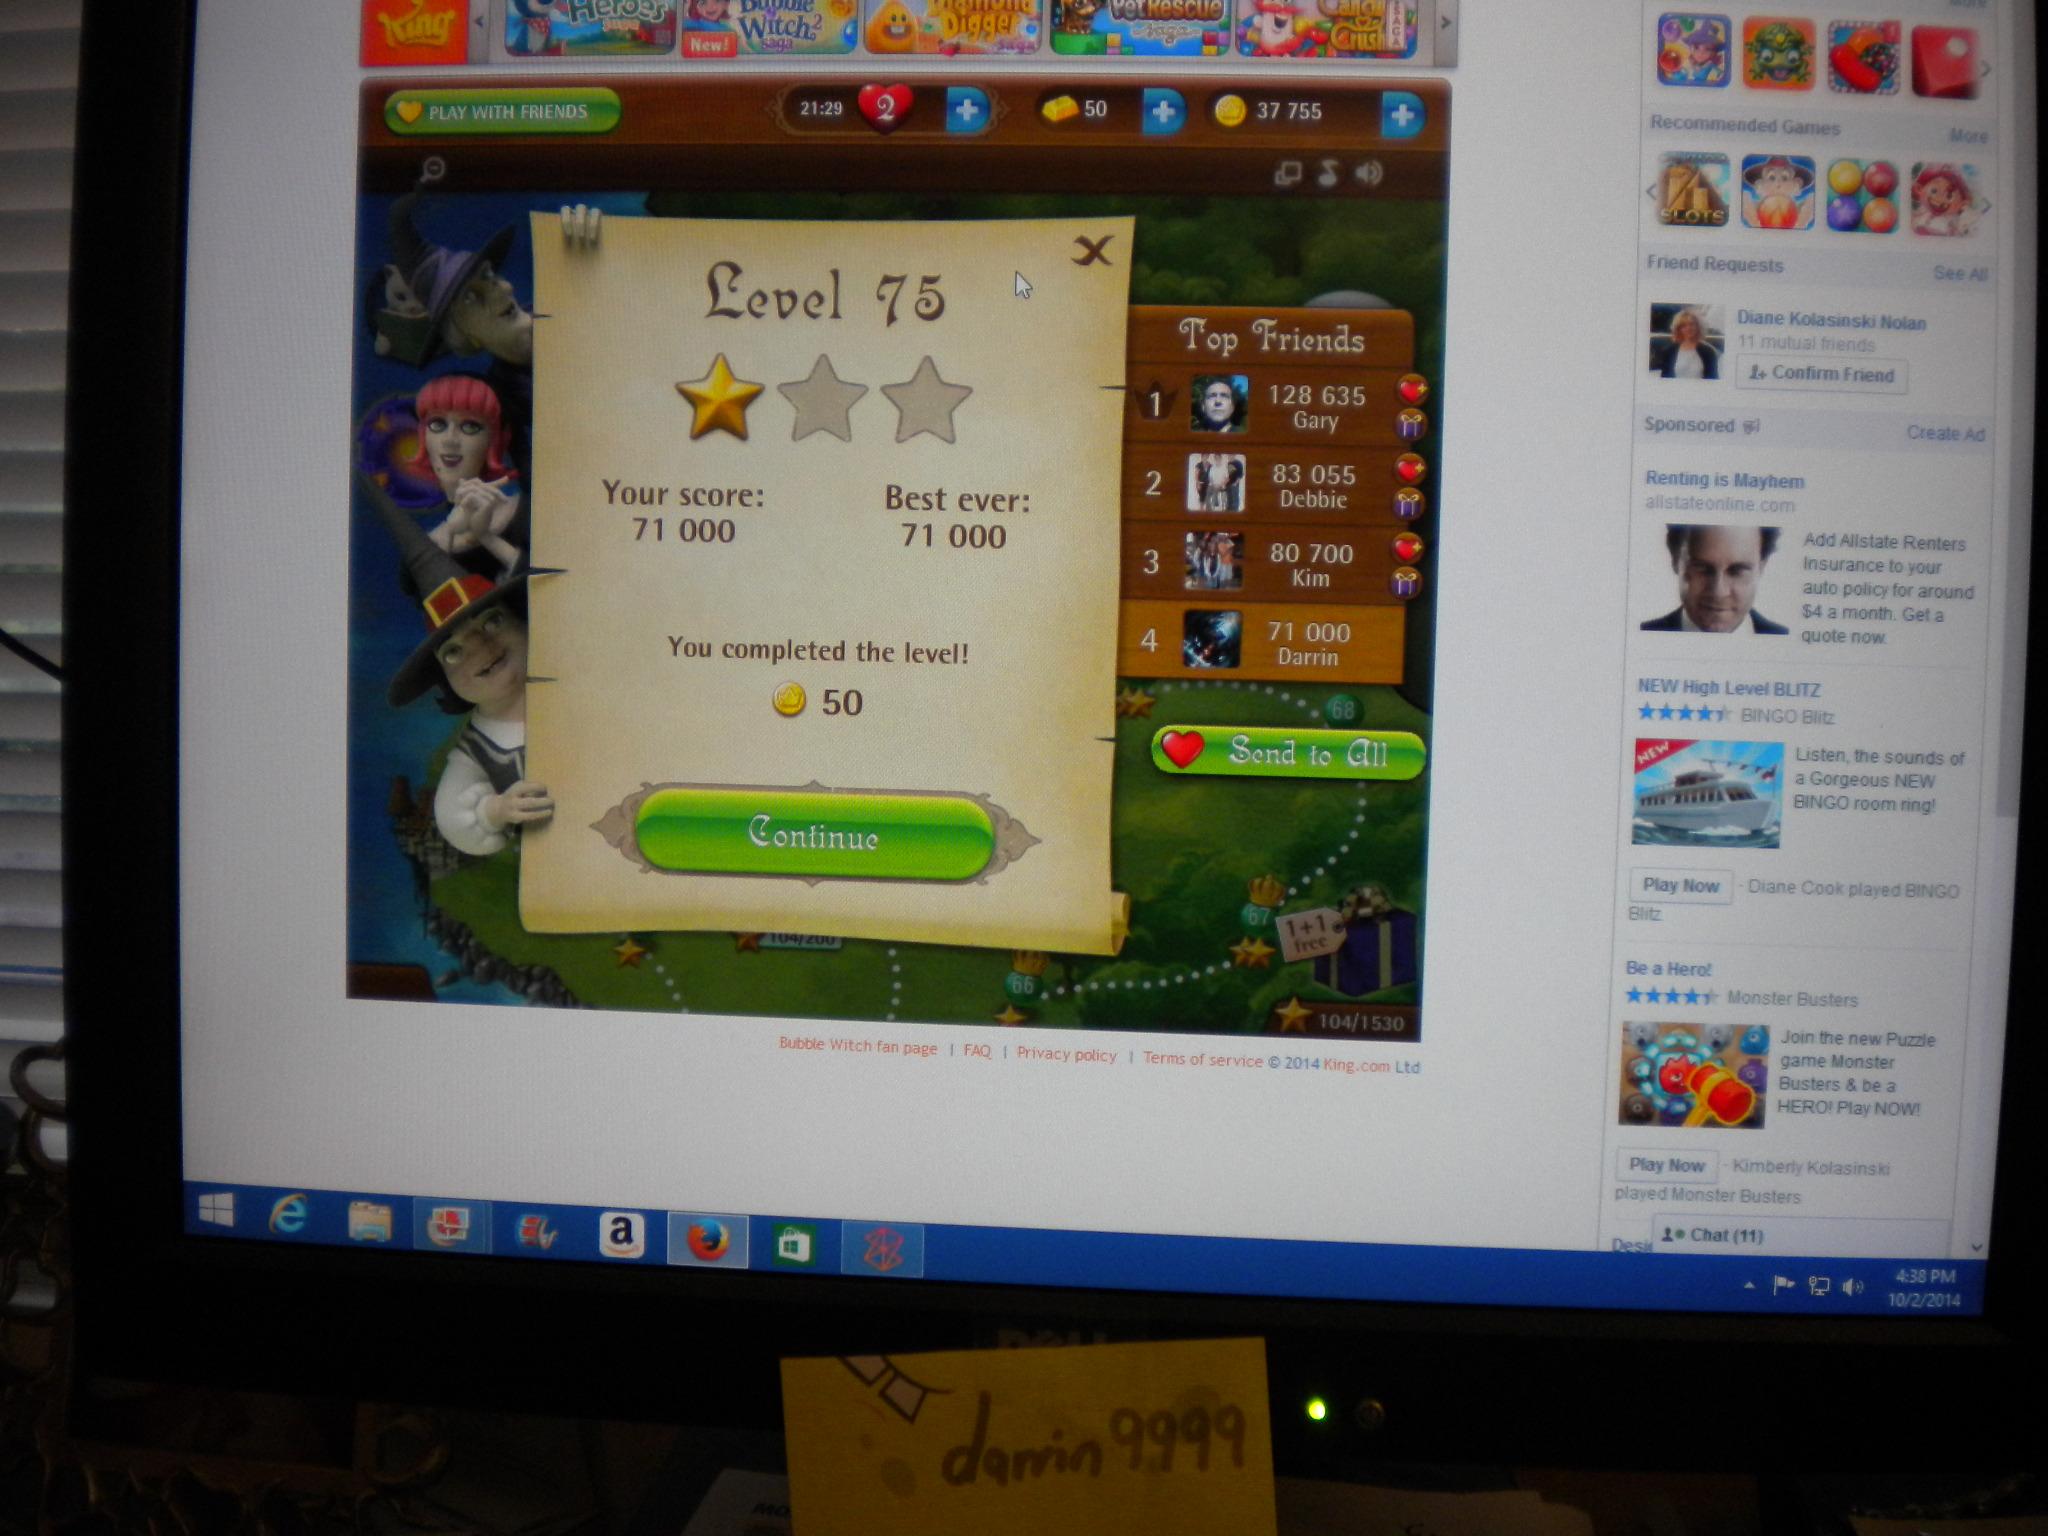 Bubble Witch Saga: Level 75 71,000 points